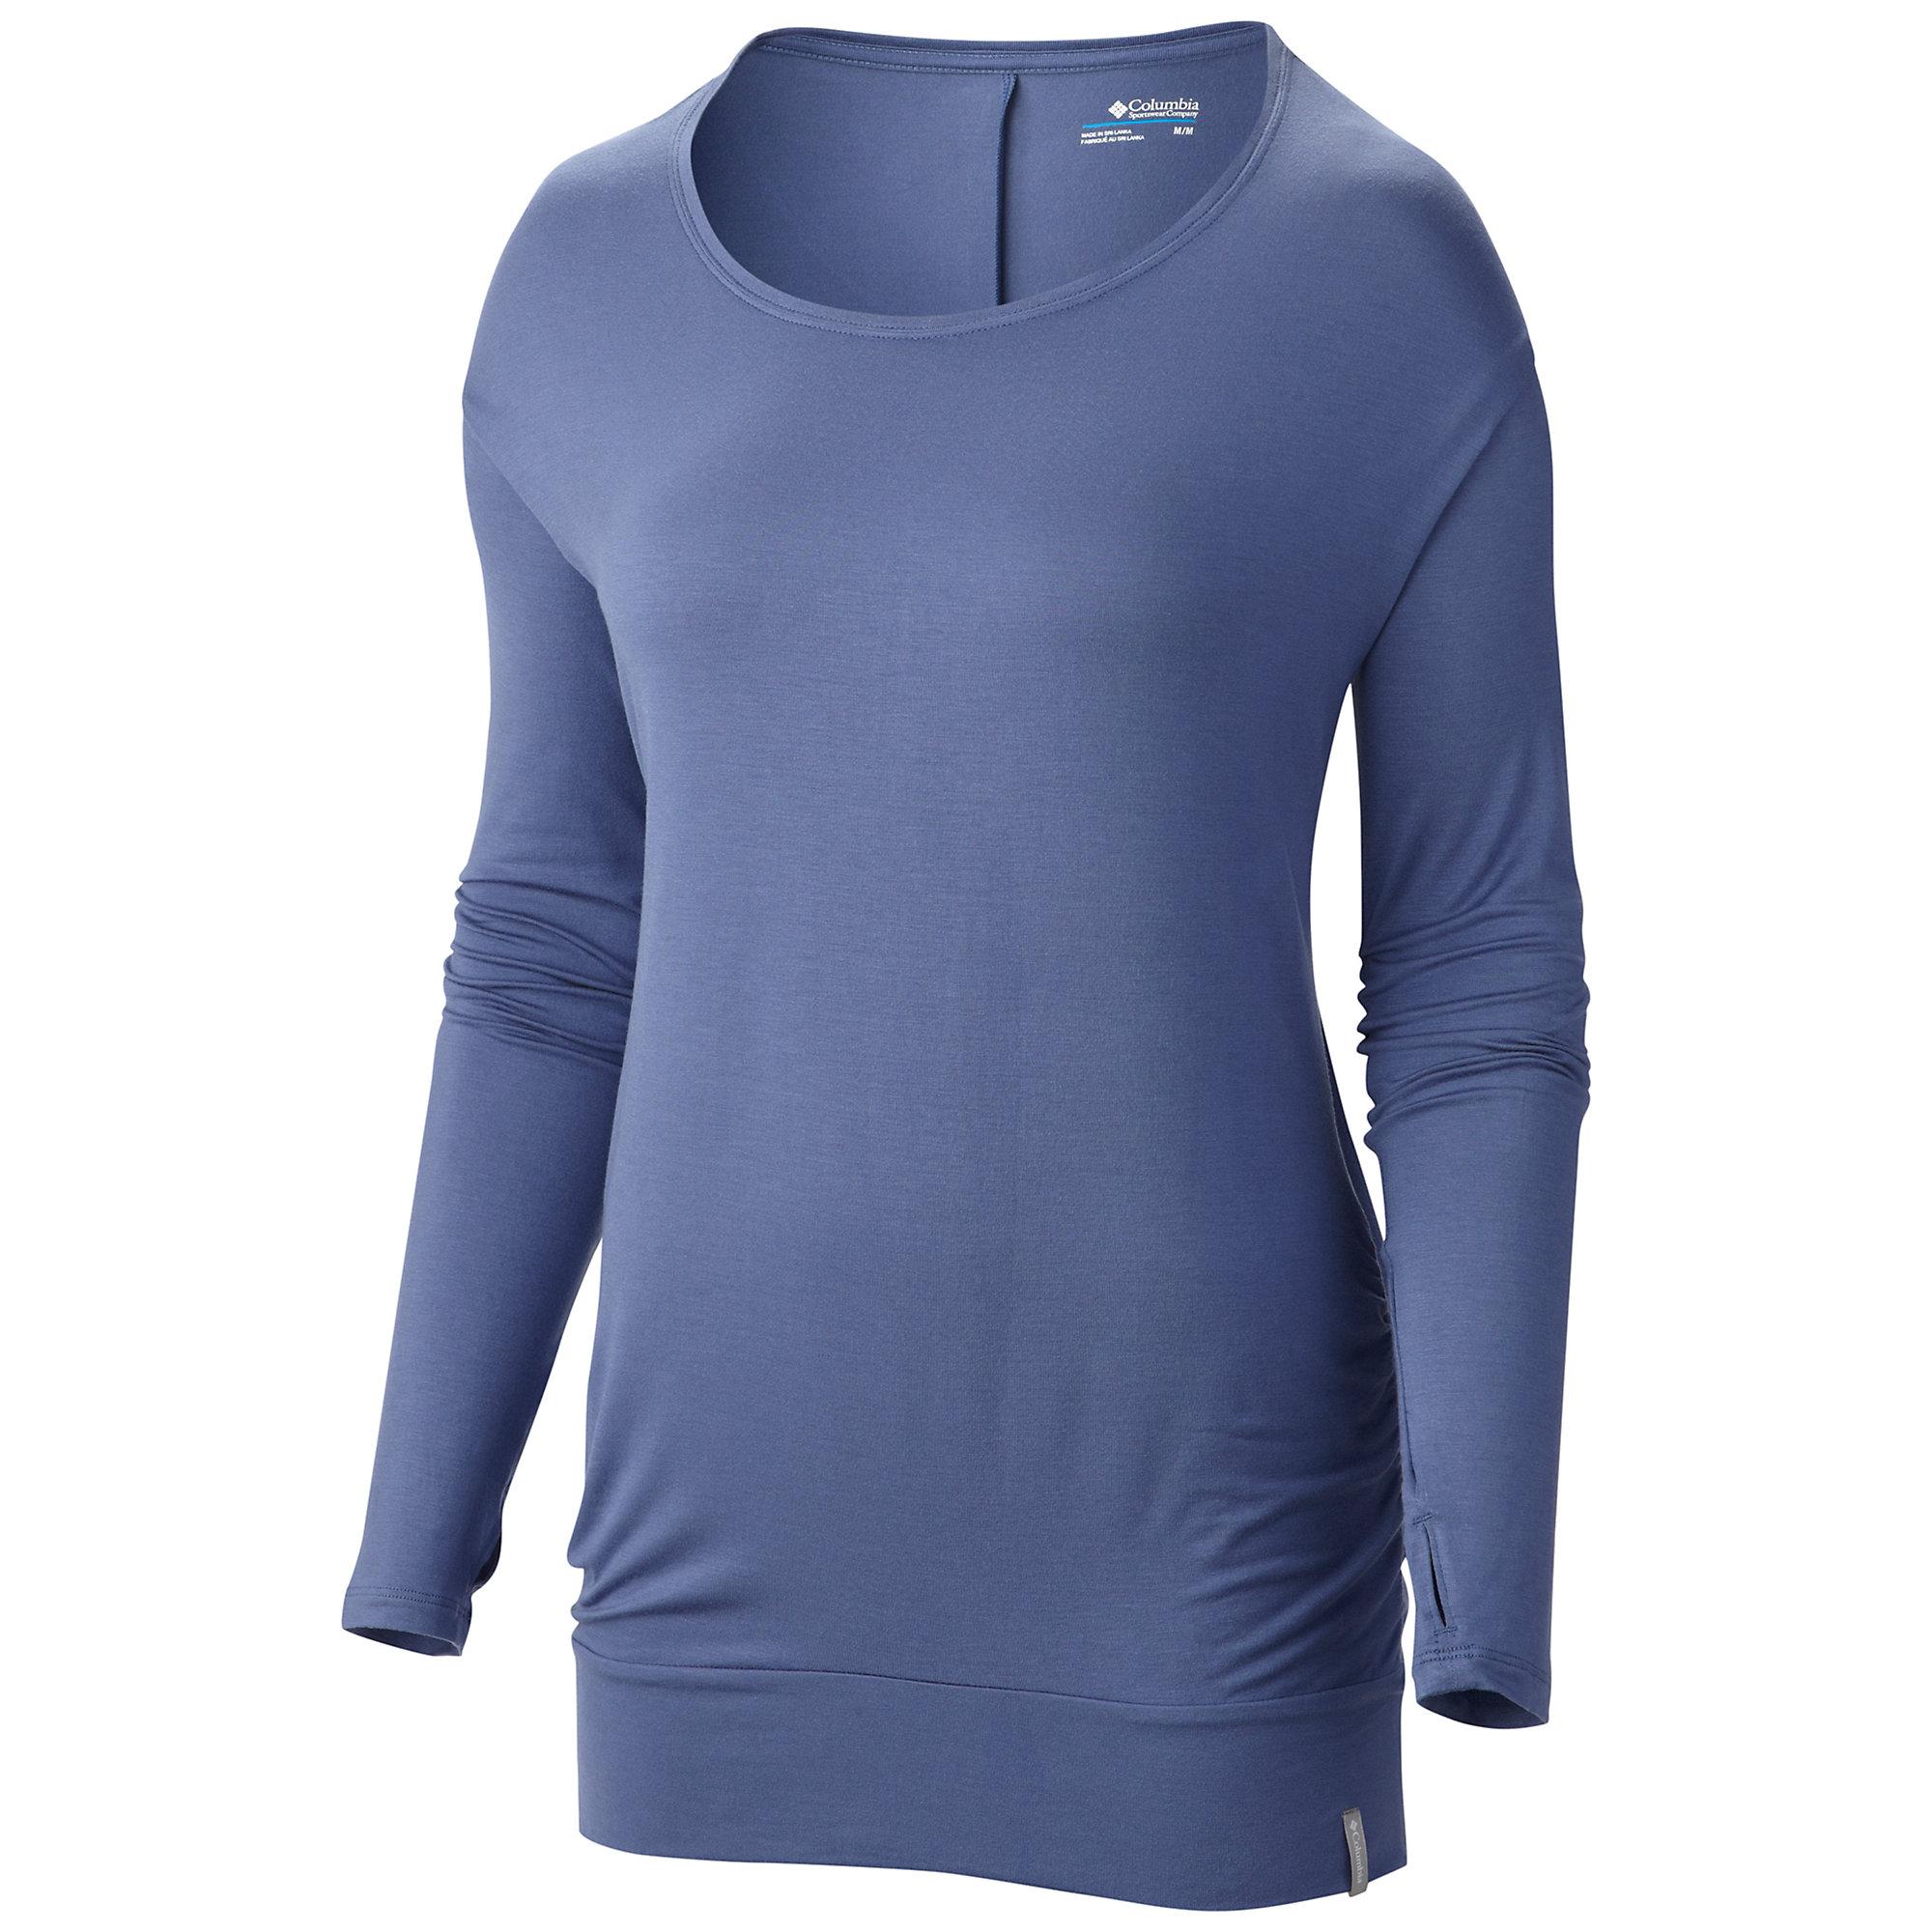 Columbia Lumianation Long Sleeve Shirt